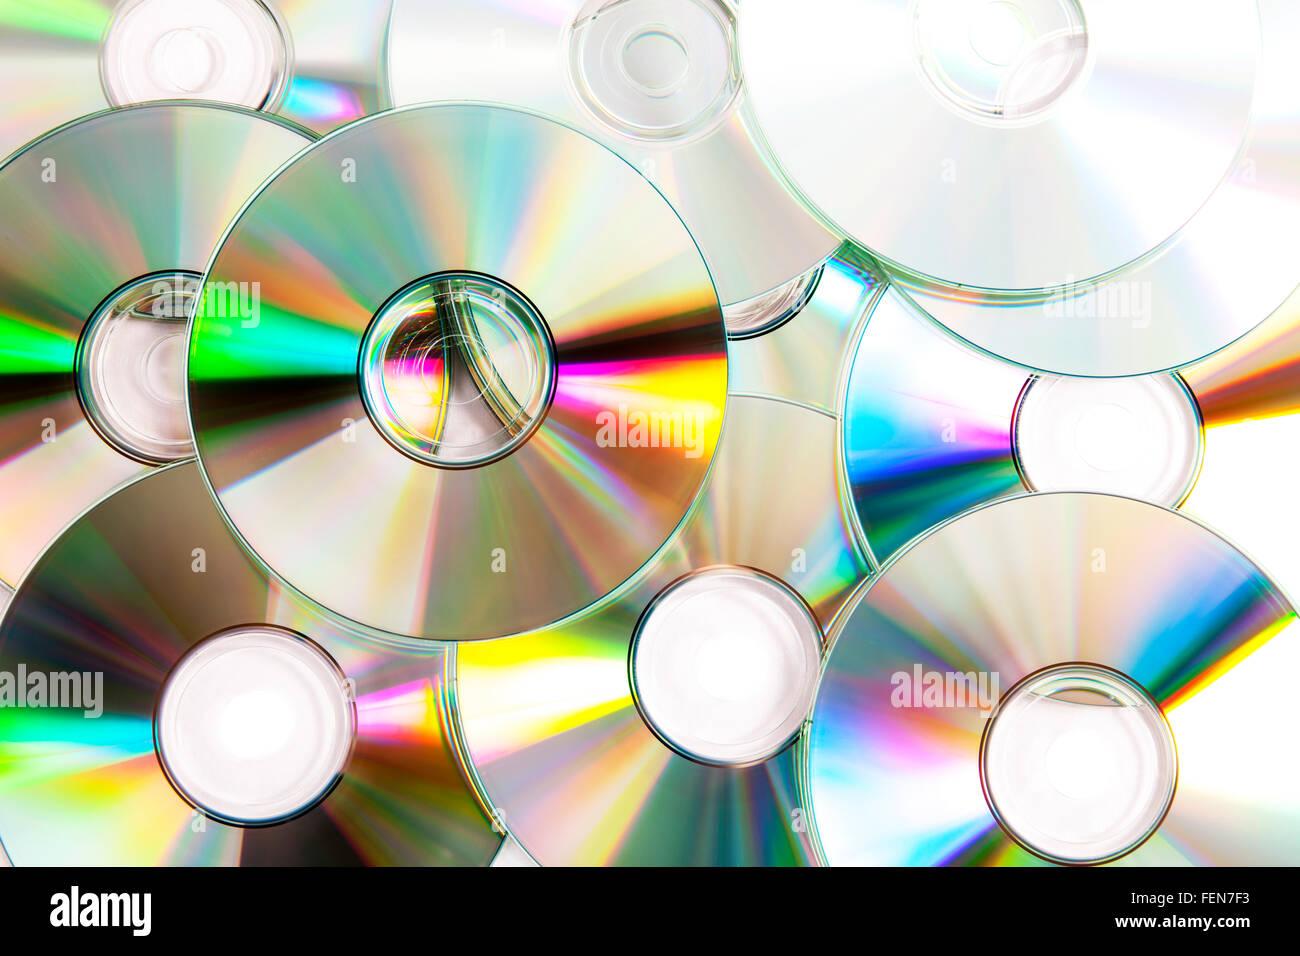 Optical storage cds cd pile stack music film films piracy digital data - Stock Image